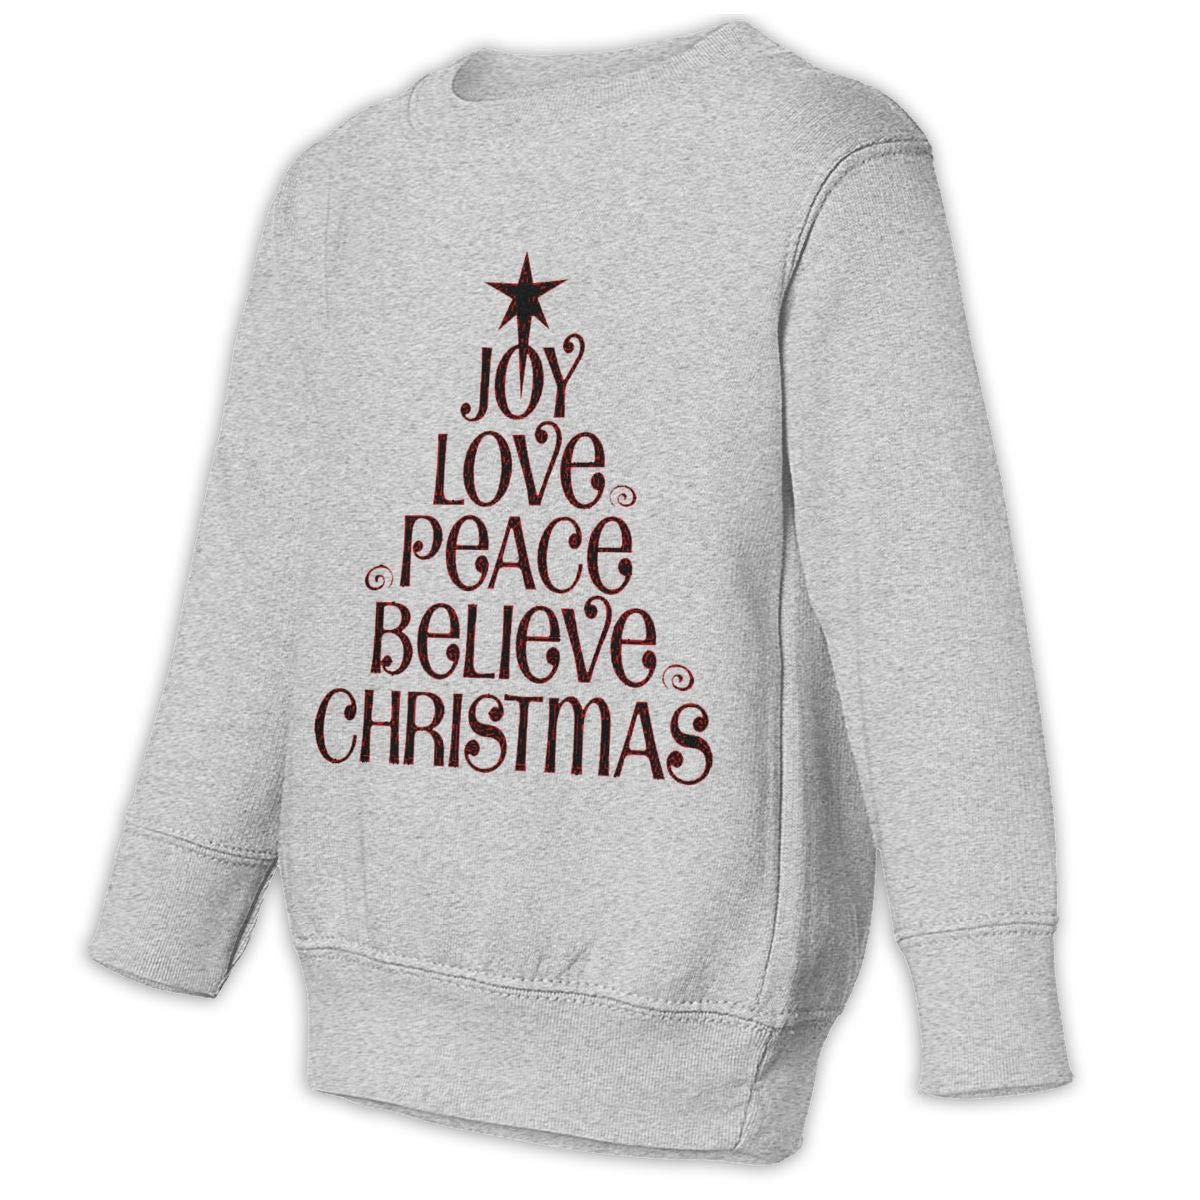 NMDJC CCQ Christmas Pray Words Baby Sweatshirt Cute Toddler Hoodies Comfortable Sweaters